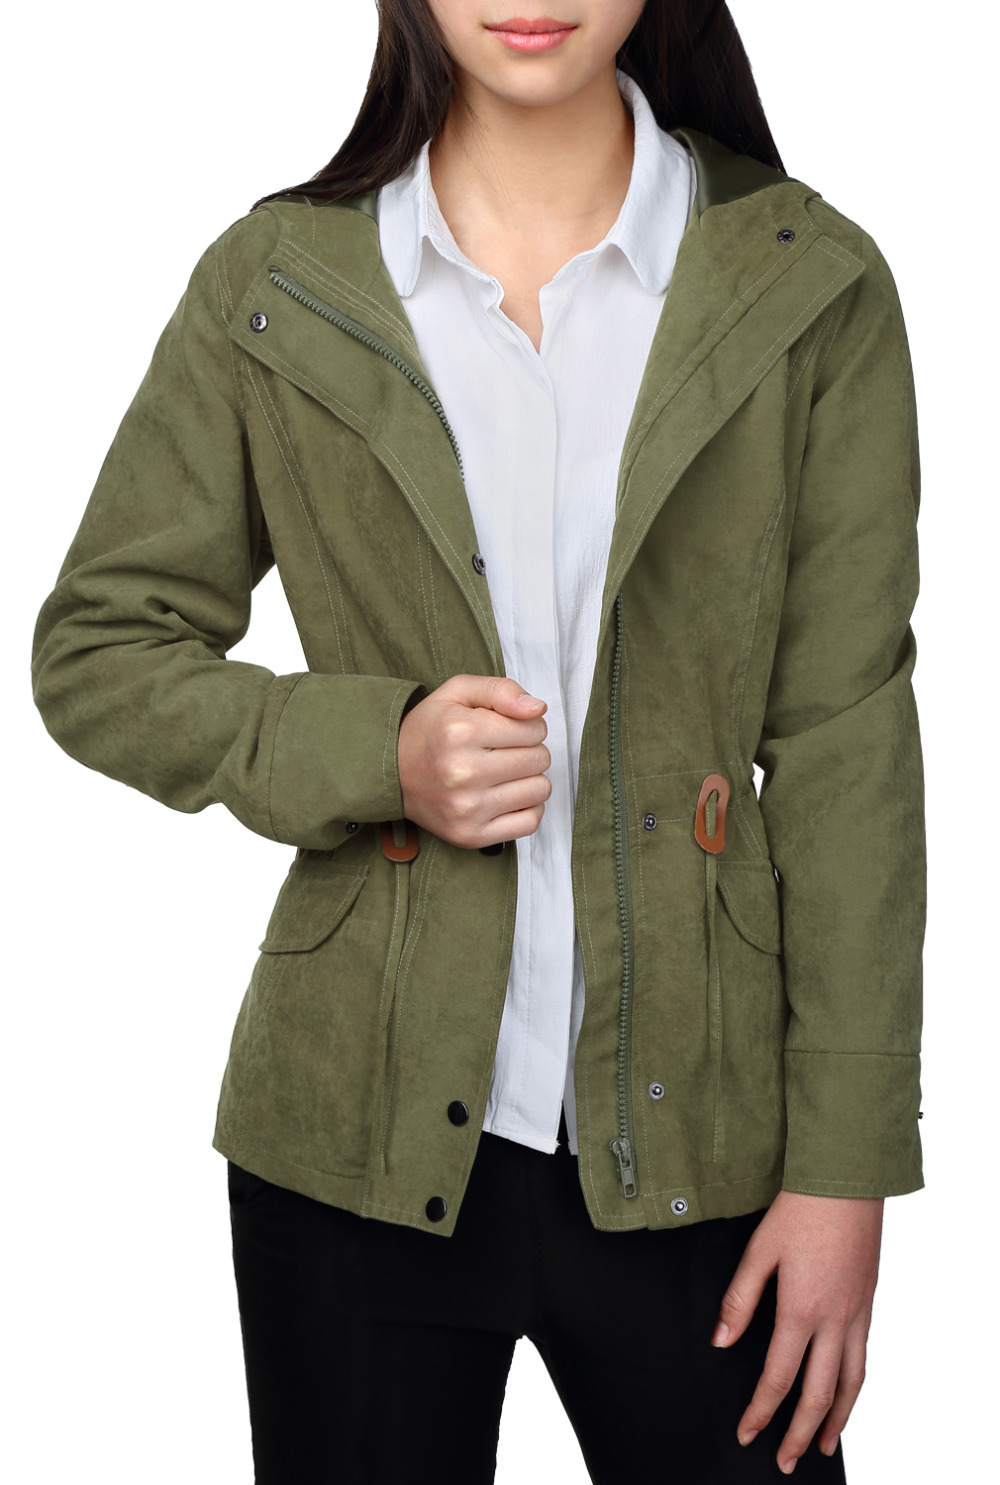 Womens spring coat